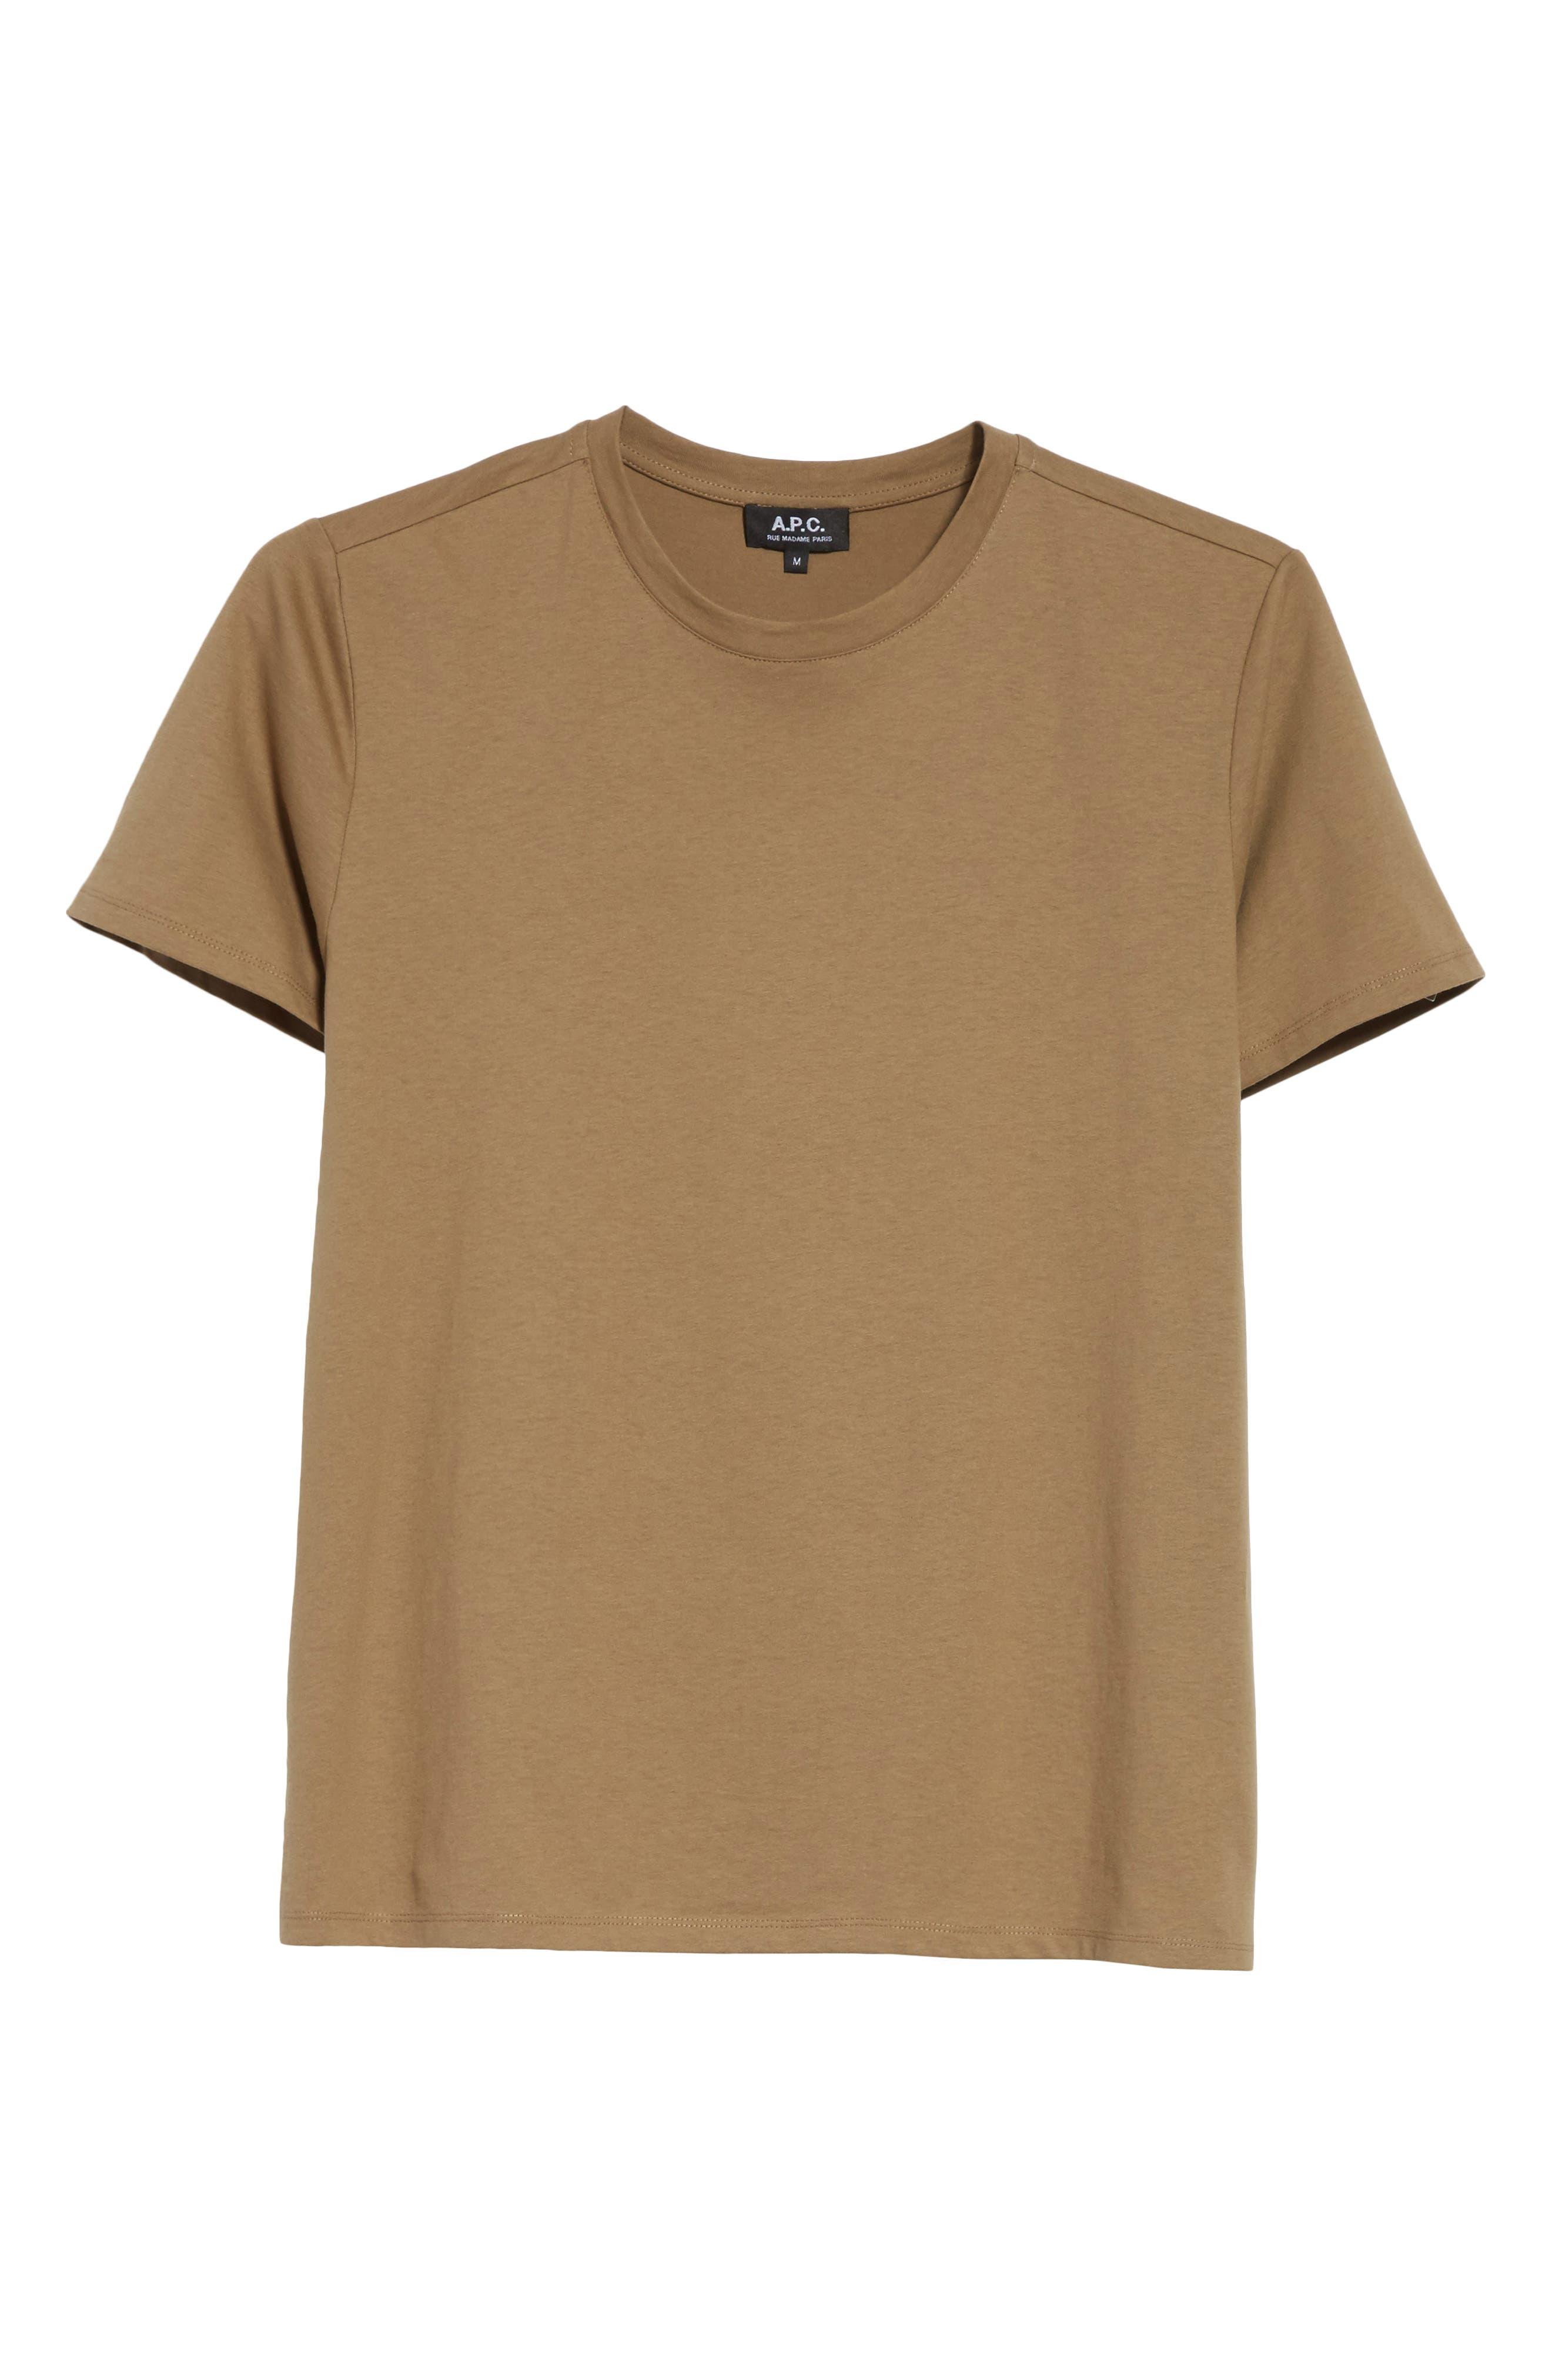 Jimmy T-Shirt,                             Alternate thumbnail 6, color,                             Taupe